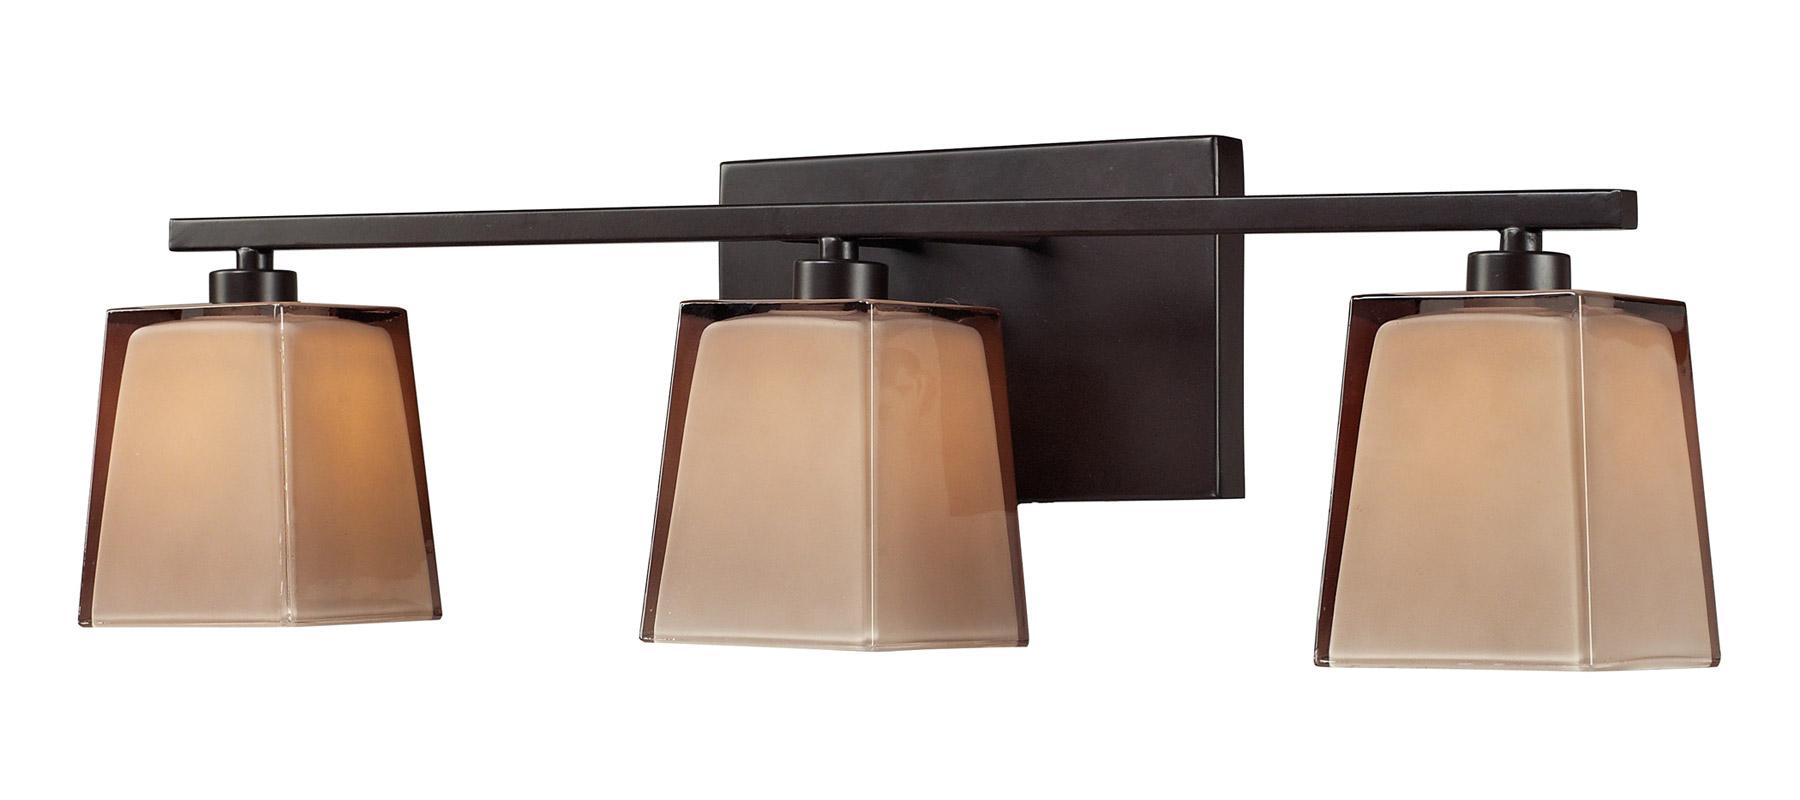 Elk Lighting 11438 3 Serenity Vanity Light